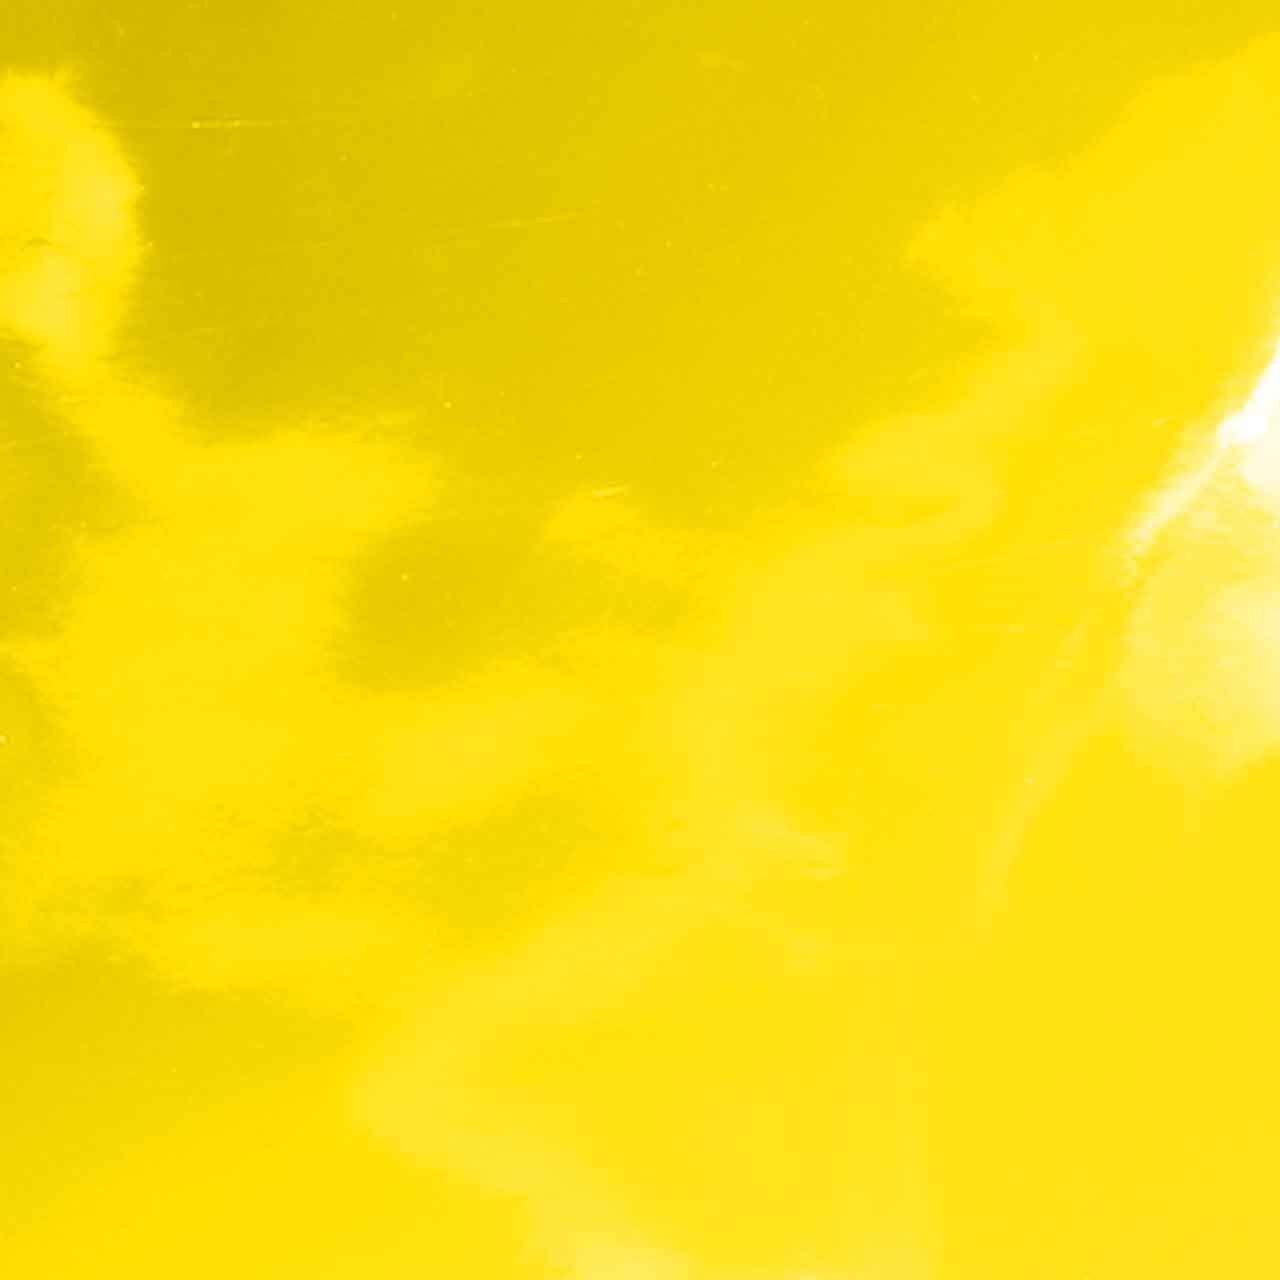 Black Stallion 6X6V1-YEL 6x6 ft Yellow Saf-Vu Welding Screen Only